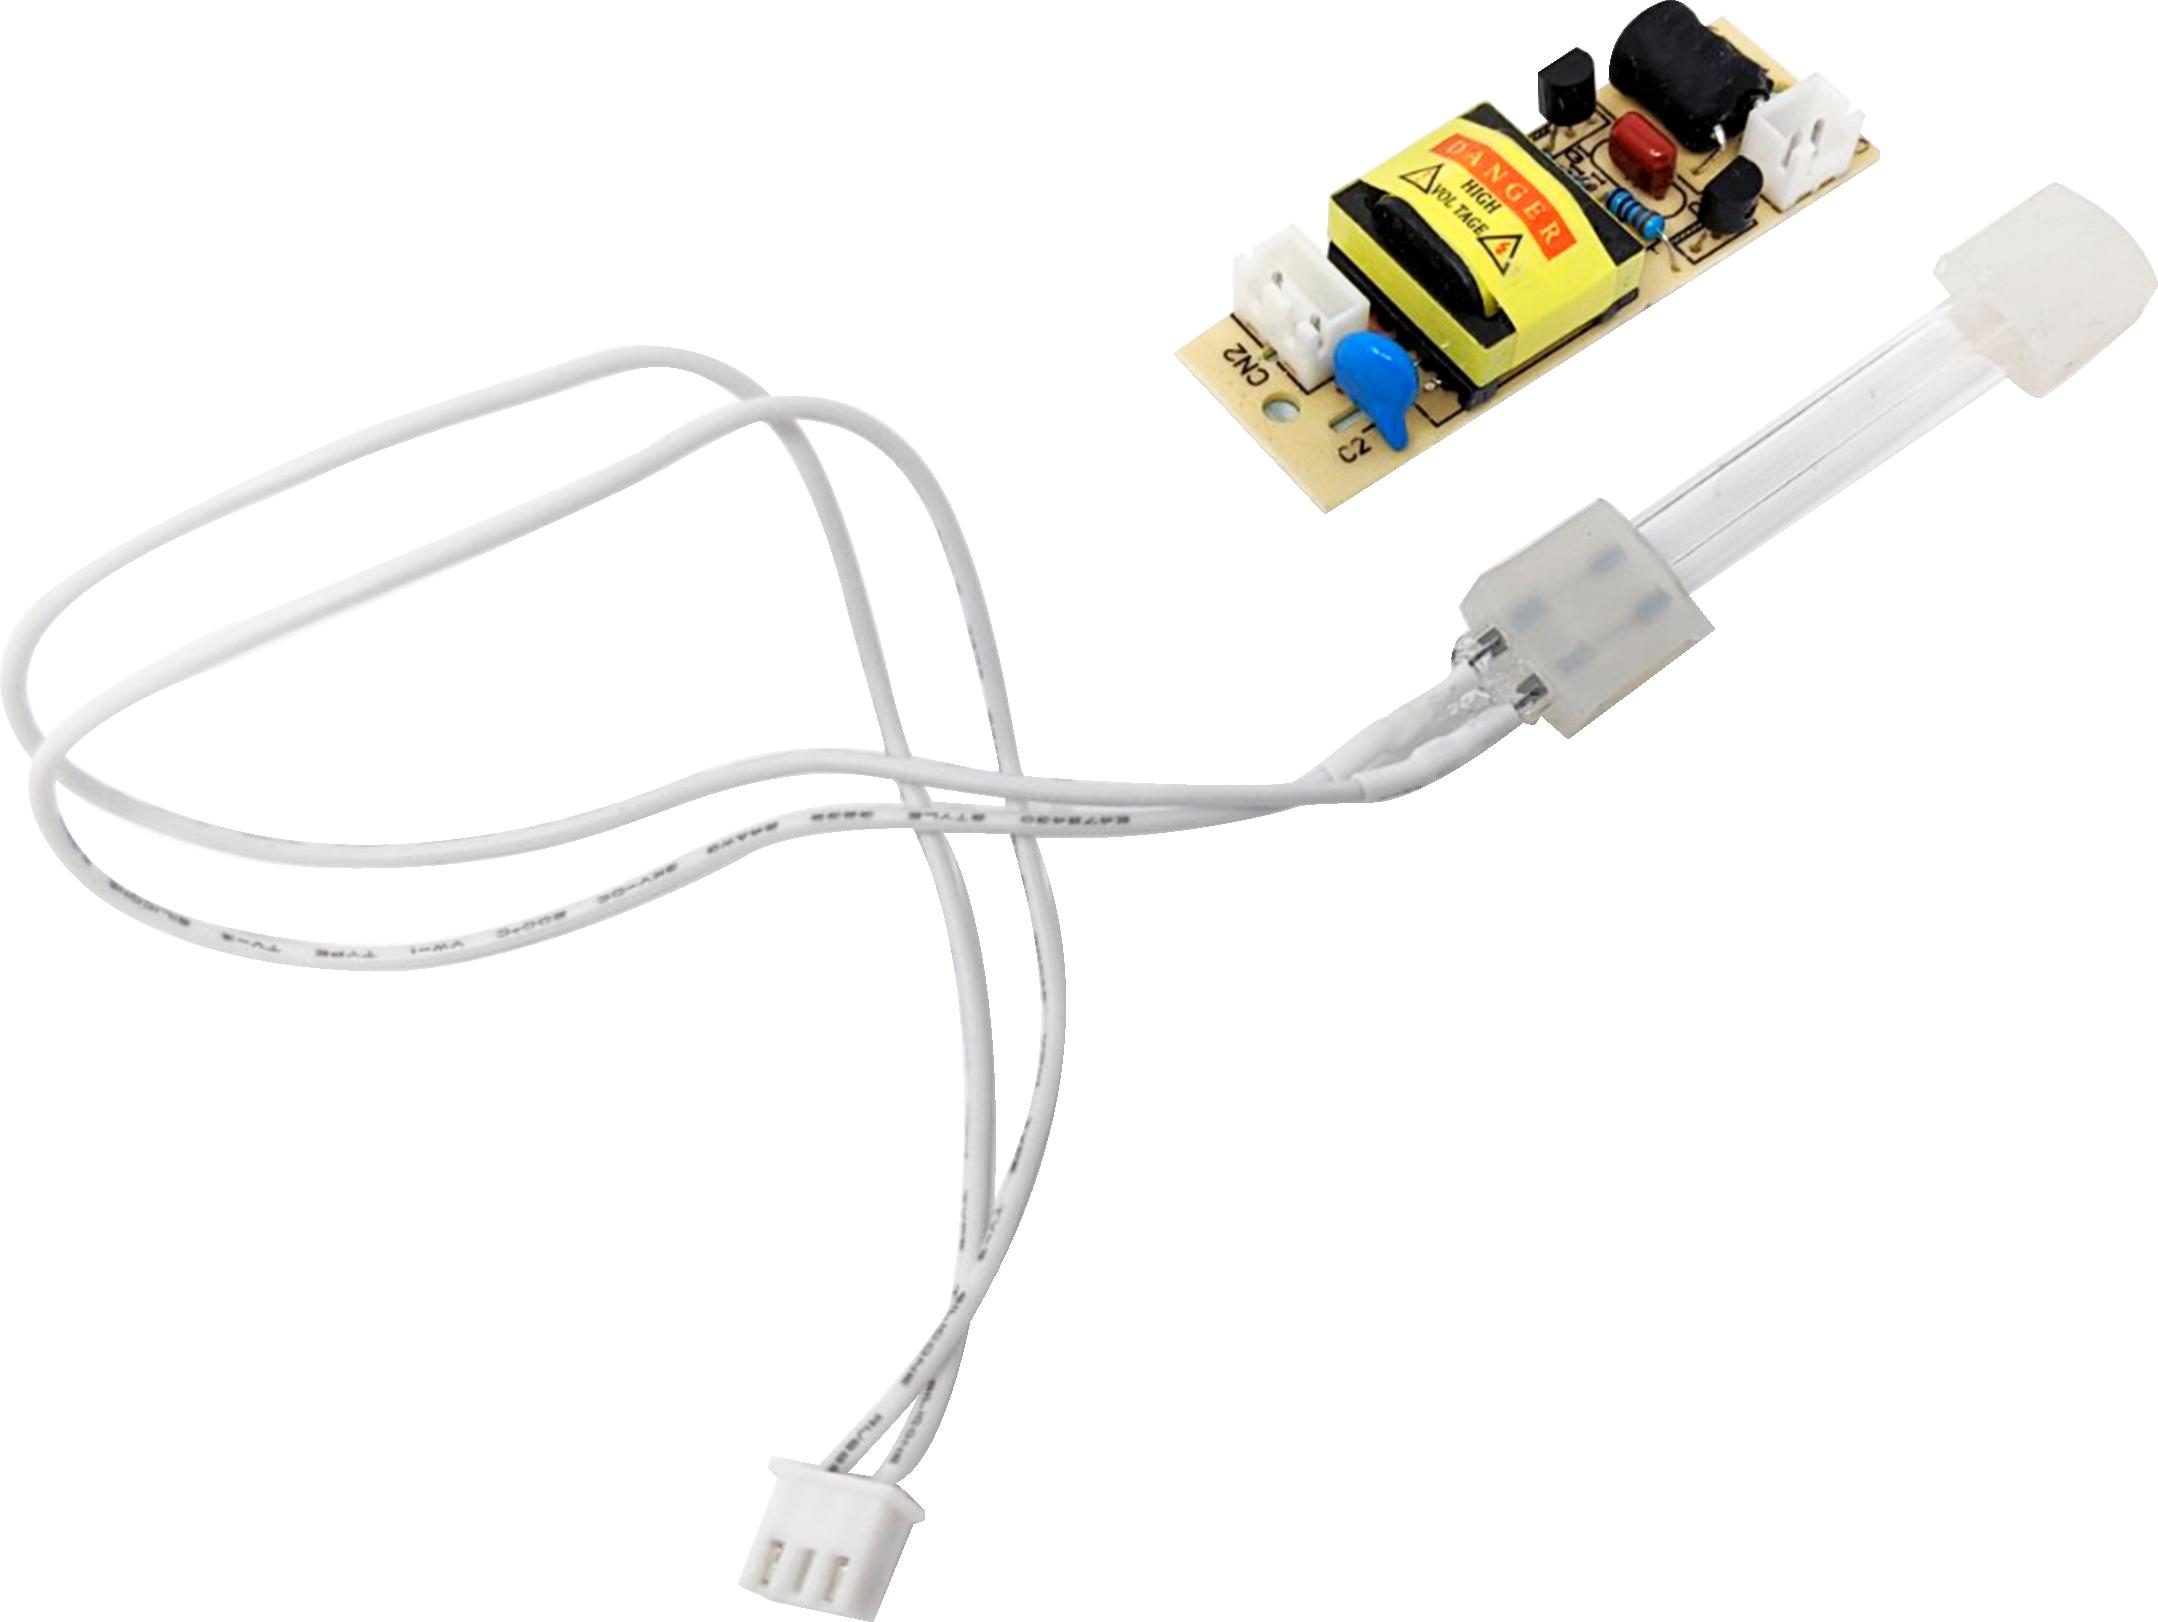 Master Series UVC Bulb Kit